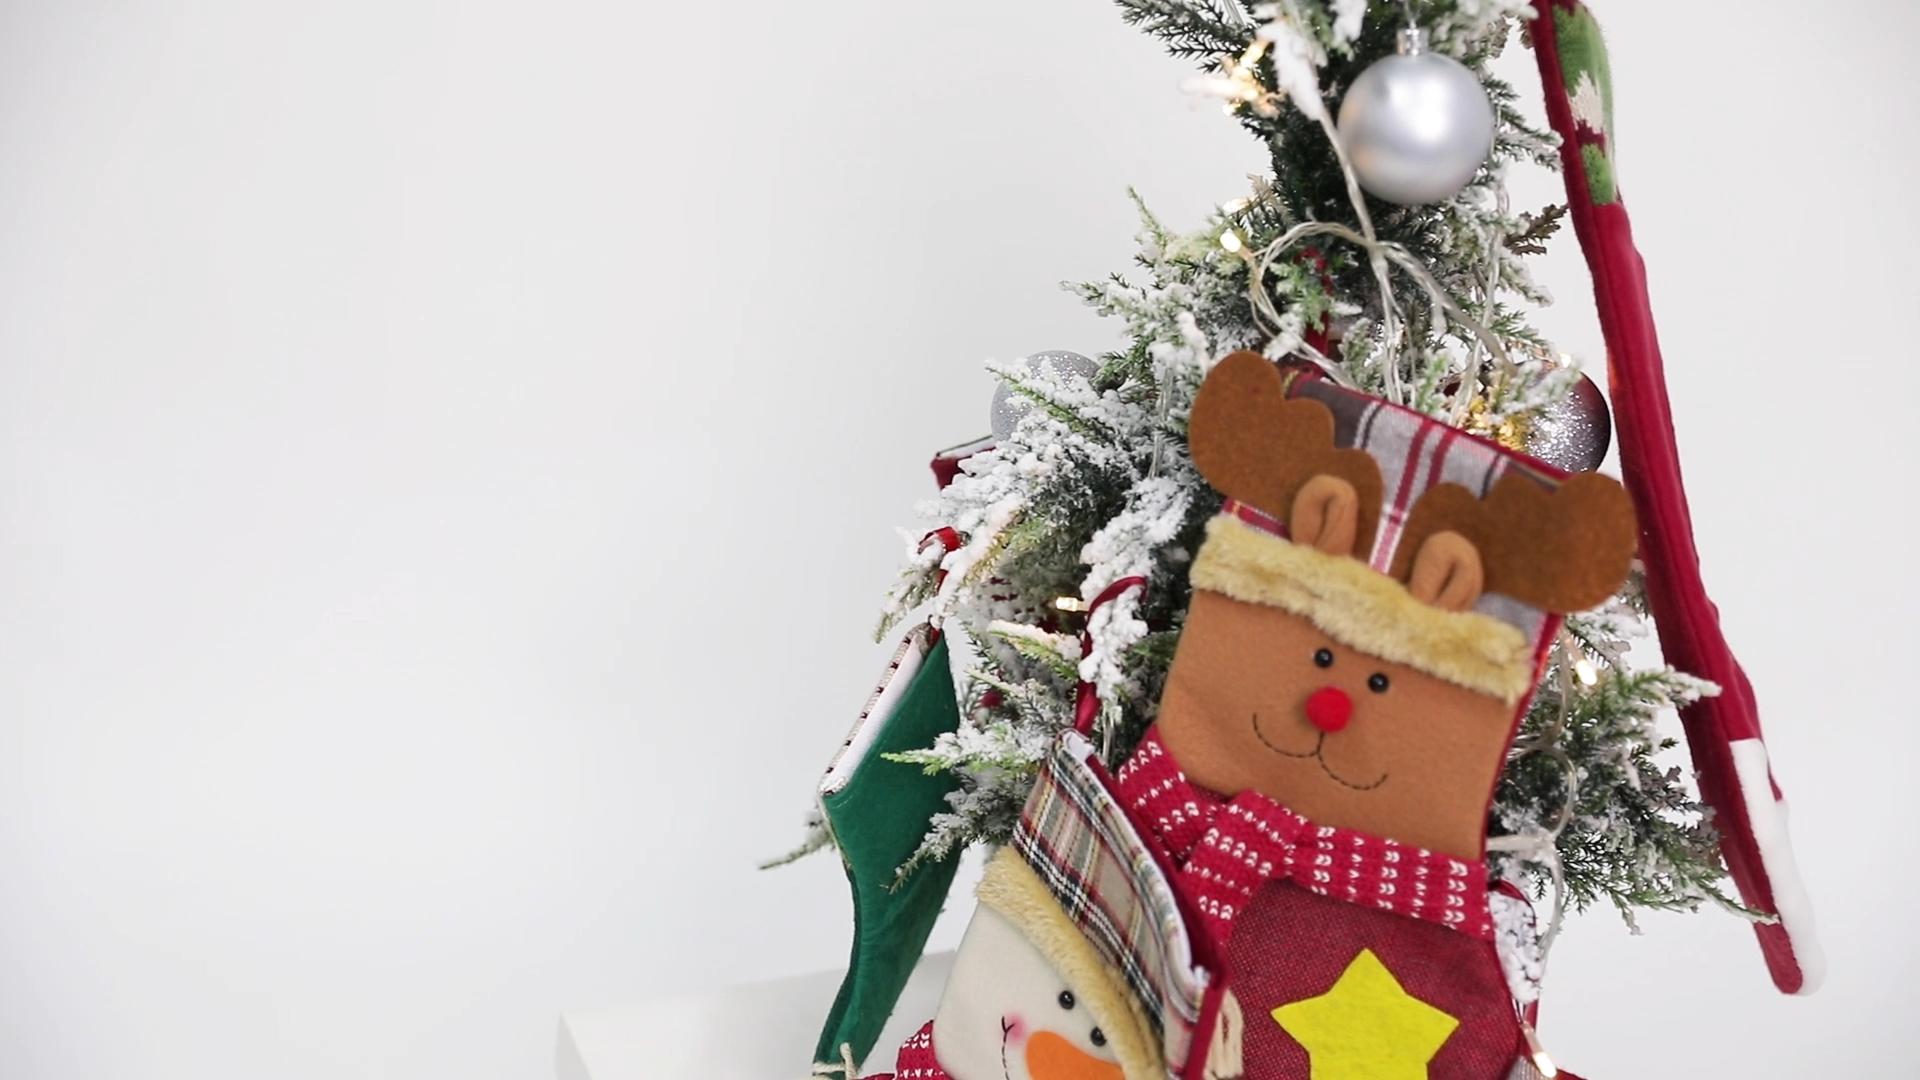 "Personalized 3 Packs 18"" Xmas Big Stockings Slipper With Snowman Handmade 3D Plush Mens Christmas Socks For Christmas Decoration"